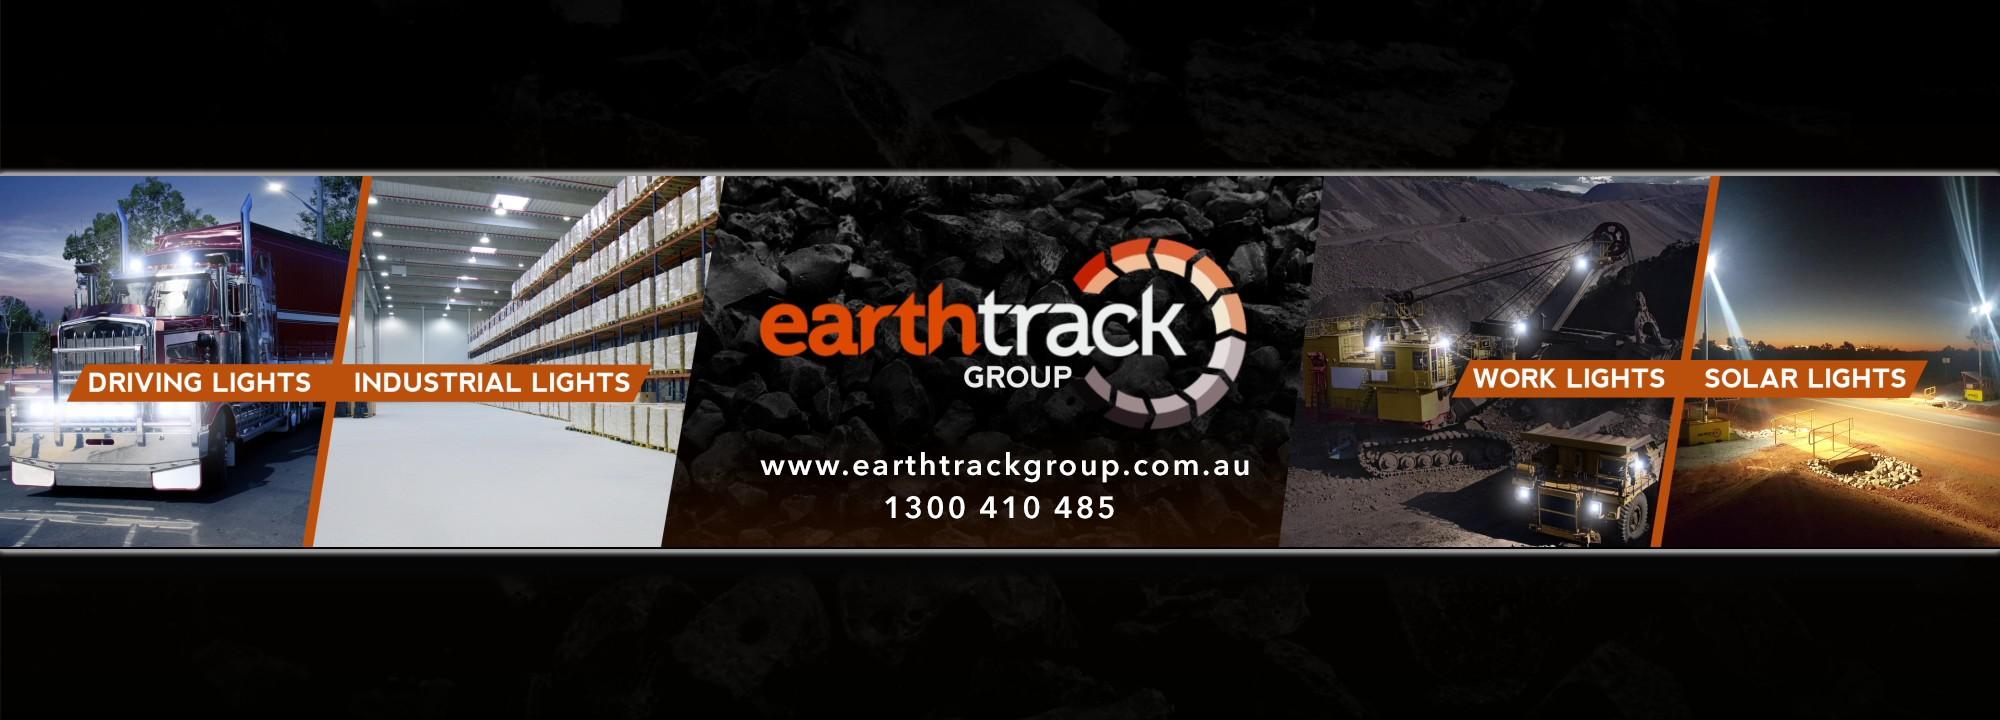 Earthtrack Group Pty Ltd Linkedin